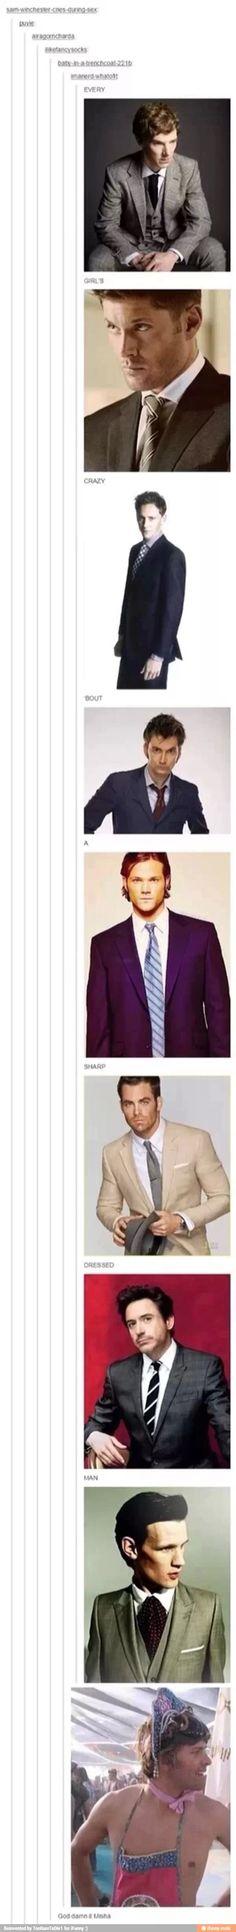 God damn it Misha lolXD